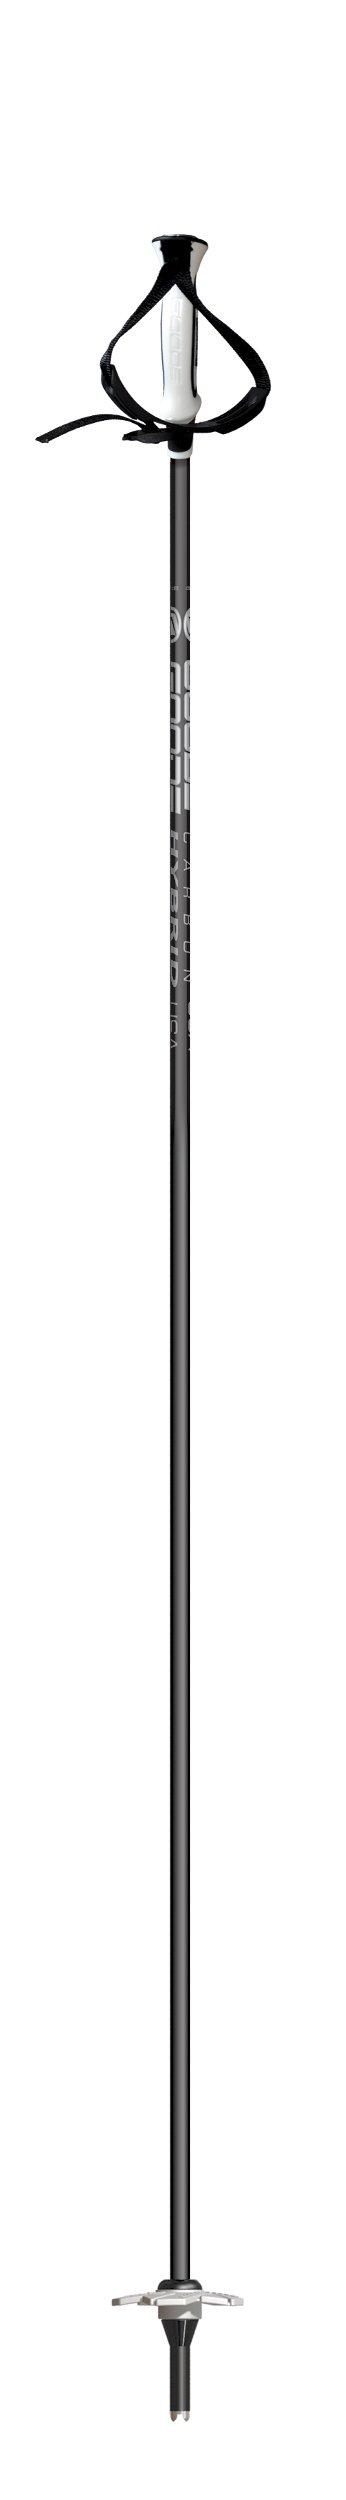 Goode Hybrid Carbon Pole with Patented G-Carbon Fiber, Black/White, 52-Inch/130cm